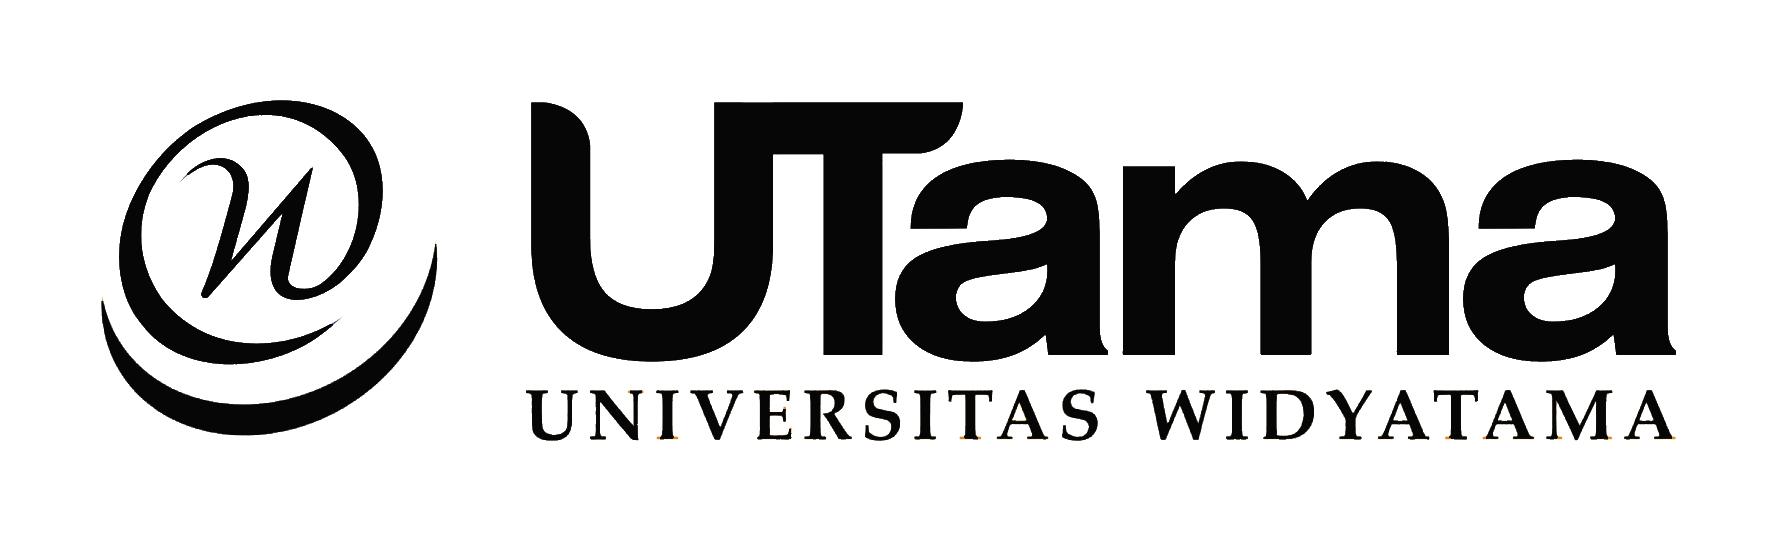 Logo Widyatama (Universitas Widyatama) Original Hitam Putih PNG